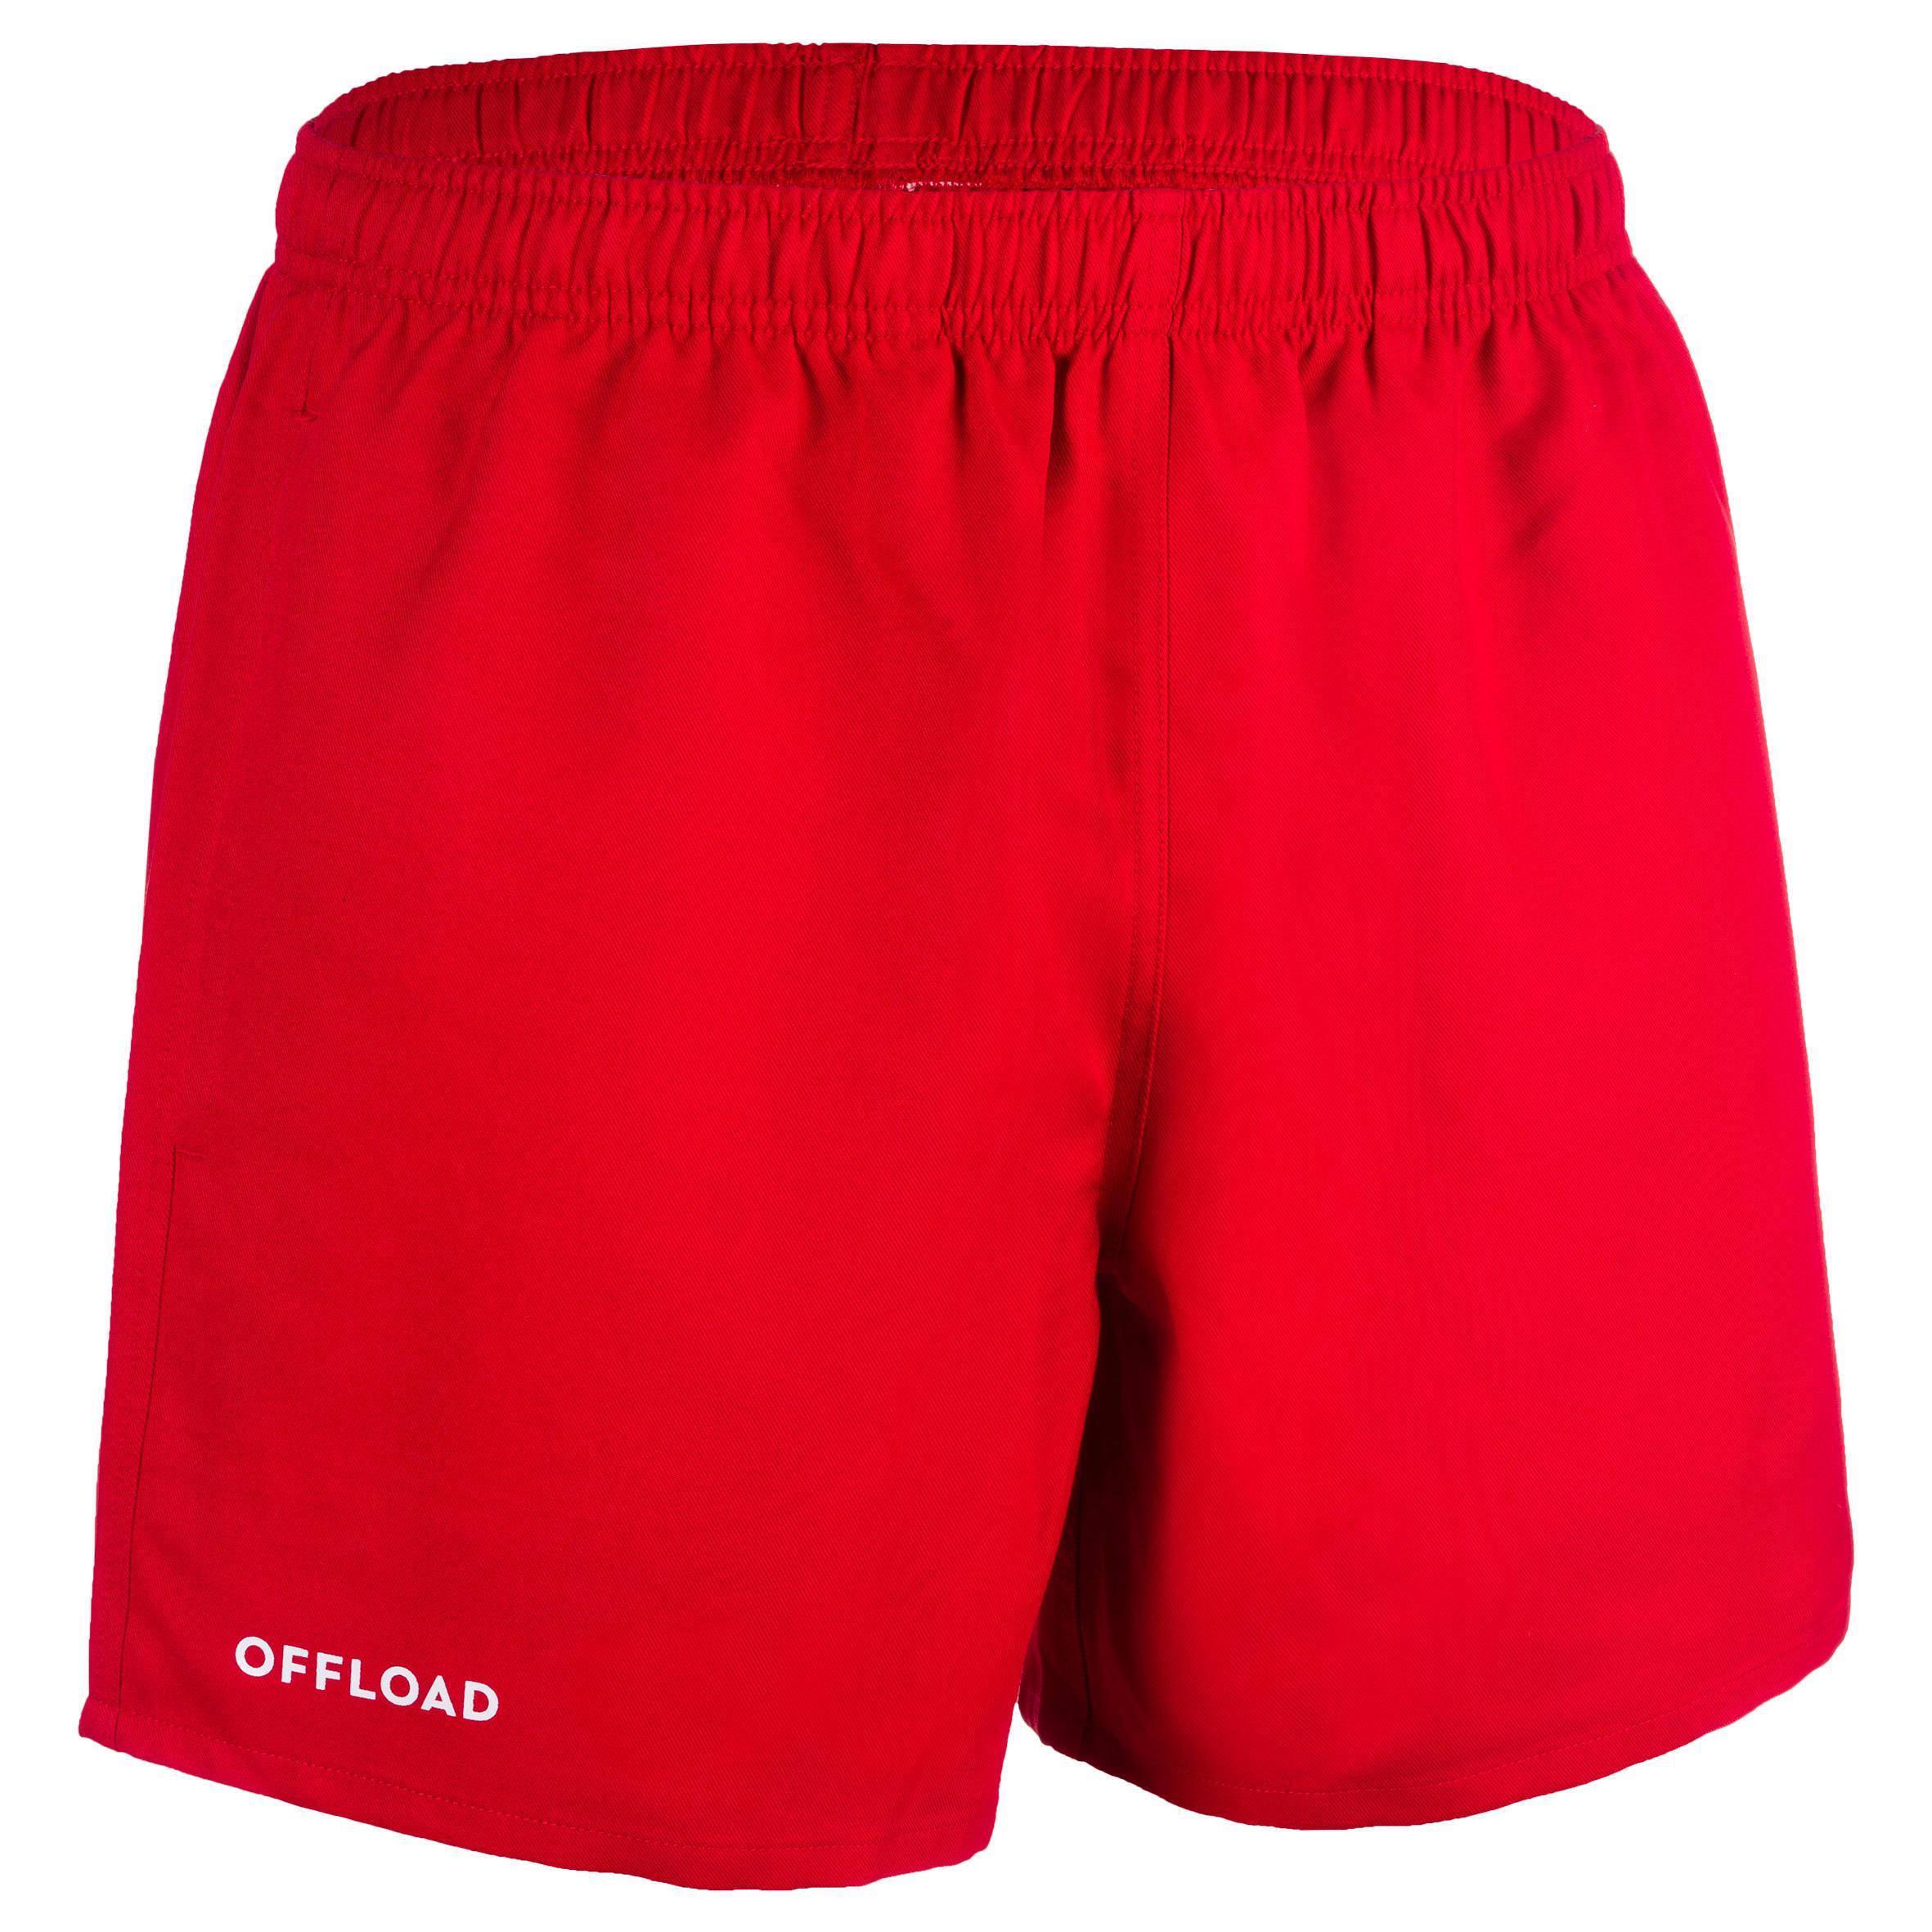 Rugbyshorts R100 Herren rot | Sportbekleidung > Sporthosen > Sportshorts | Rot | Offload